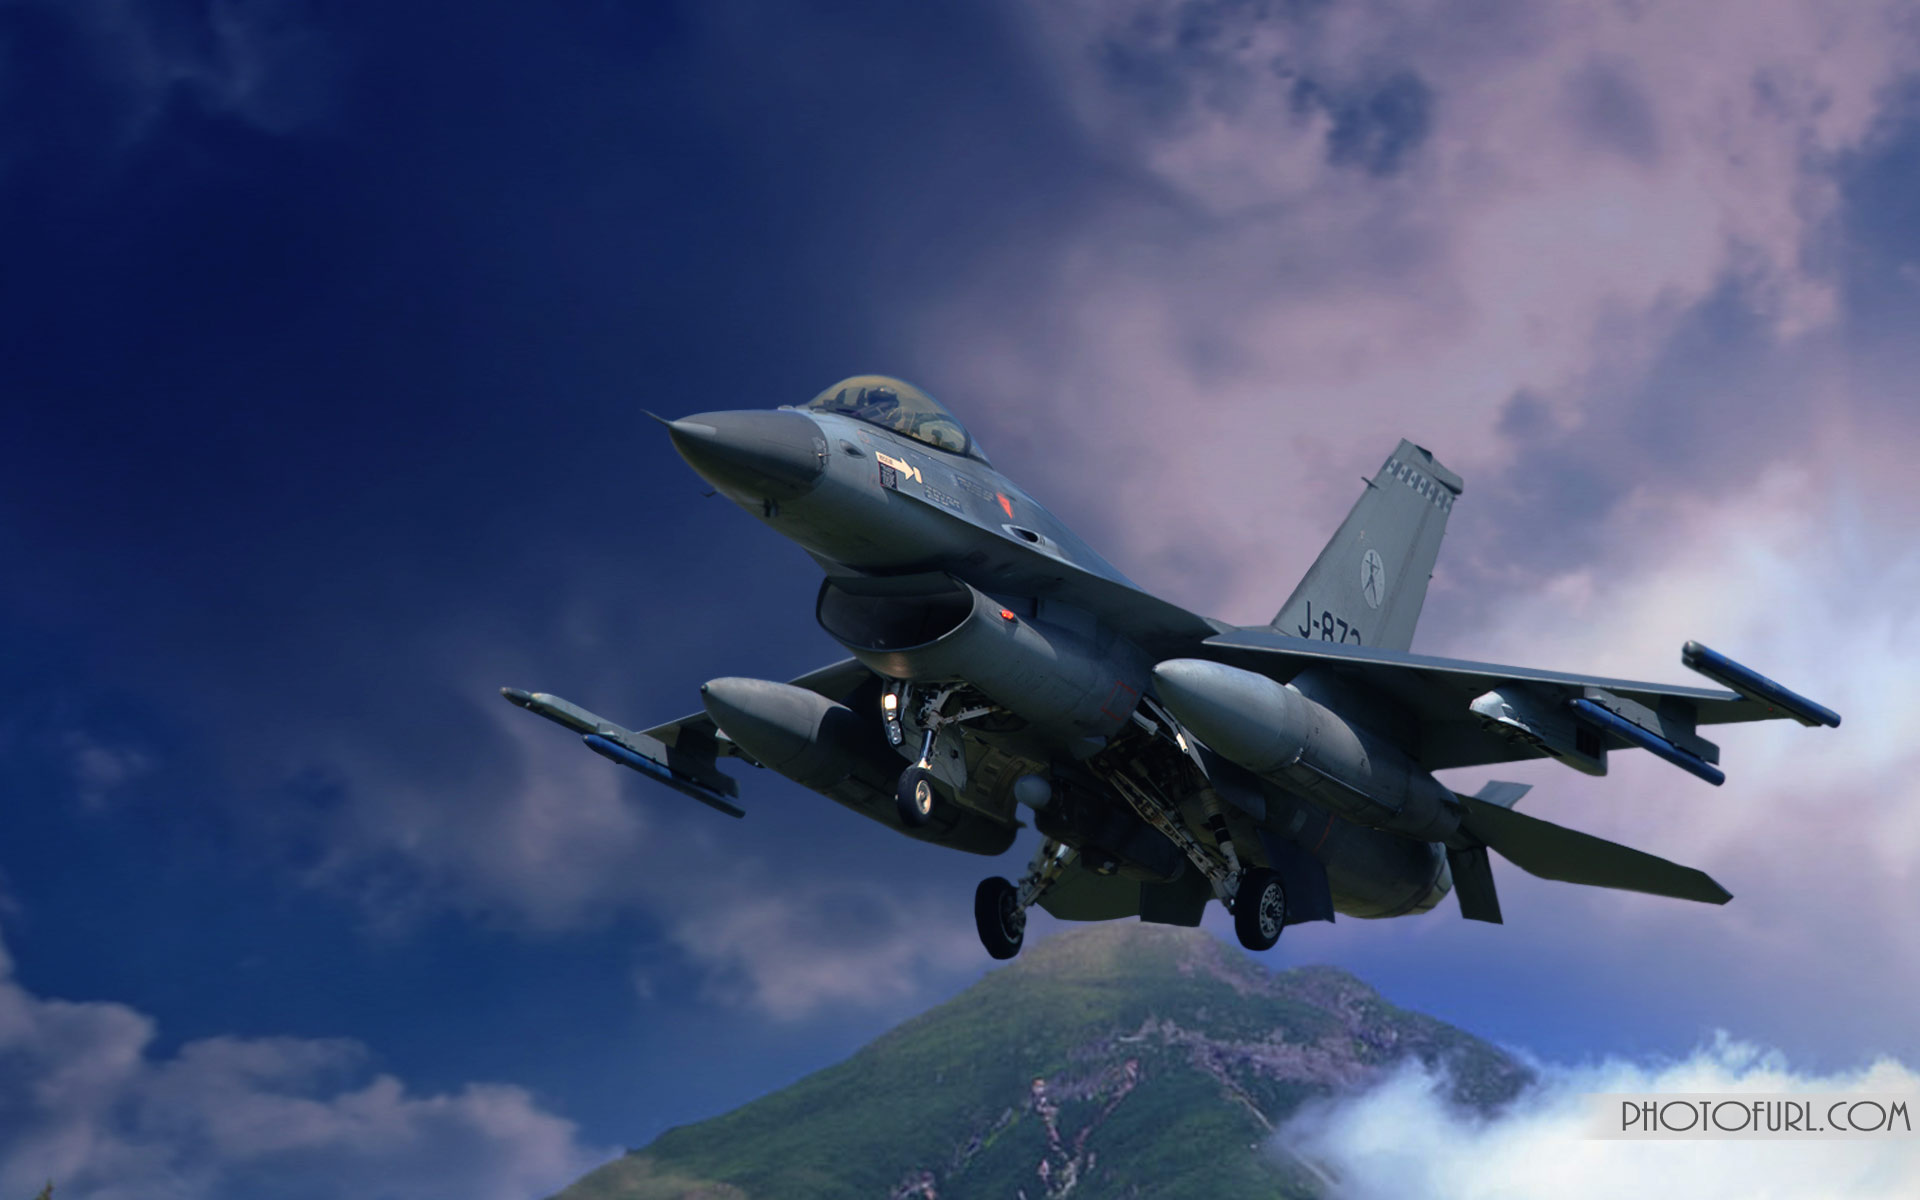 Fighter Jets Wallpaper 1080p